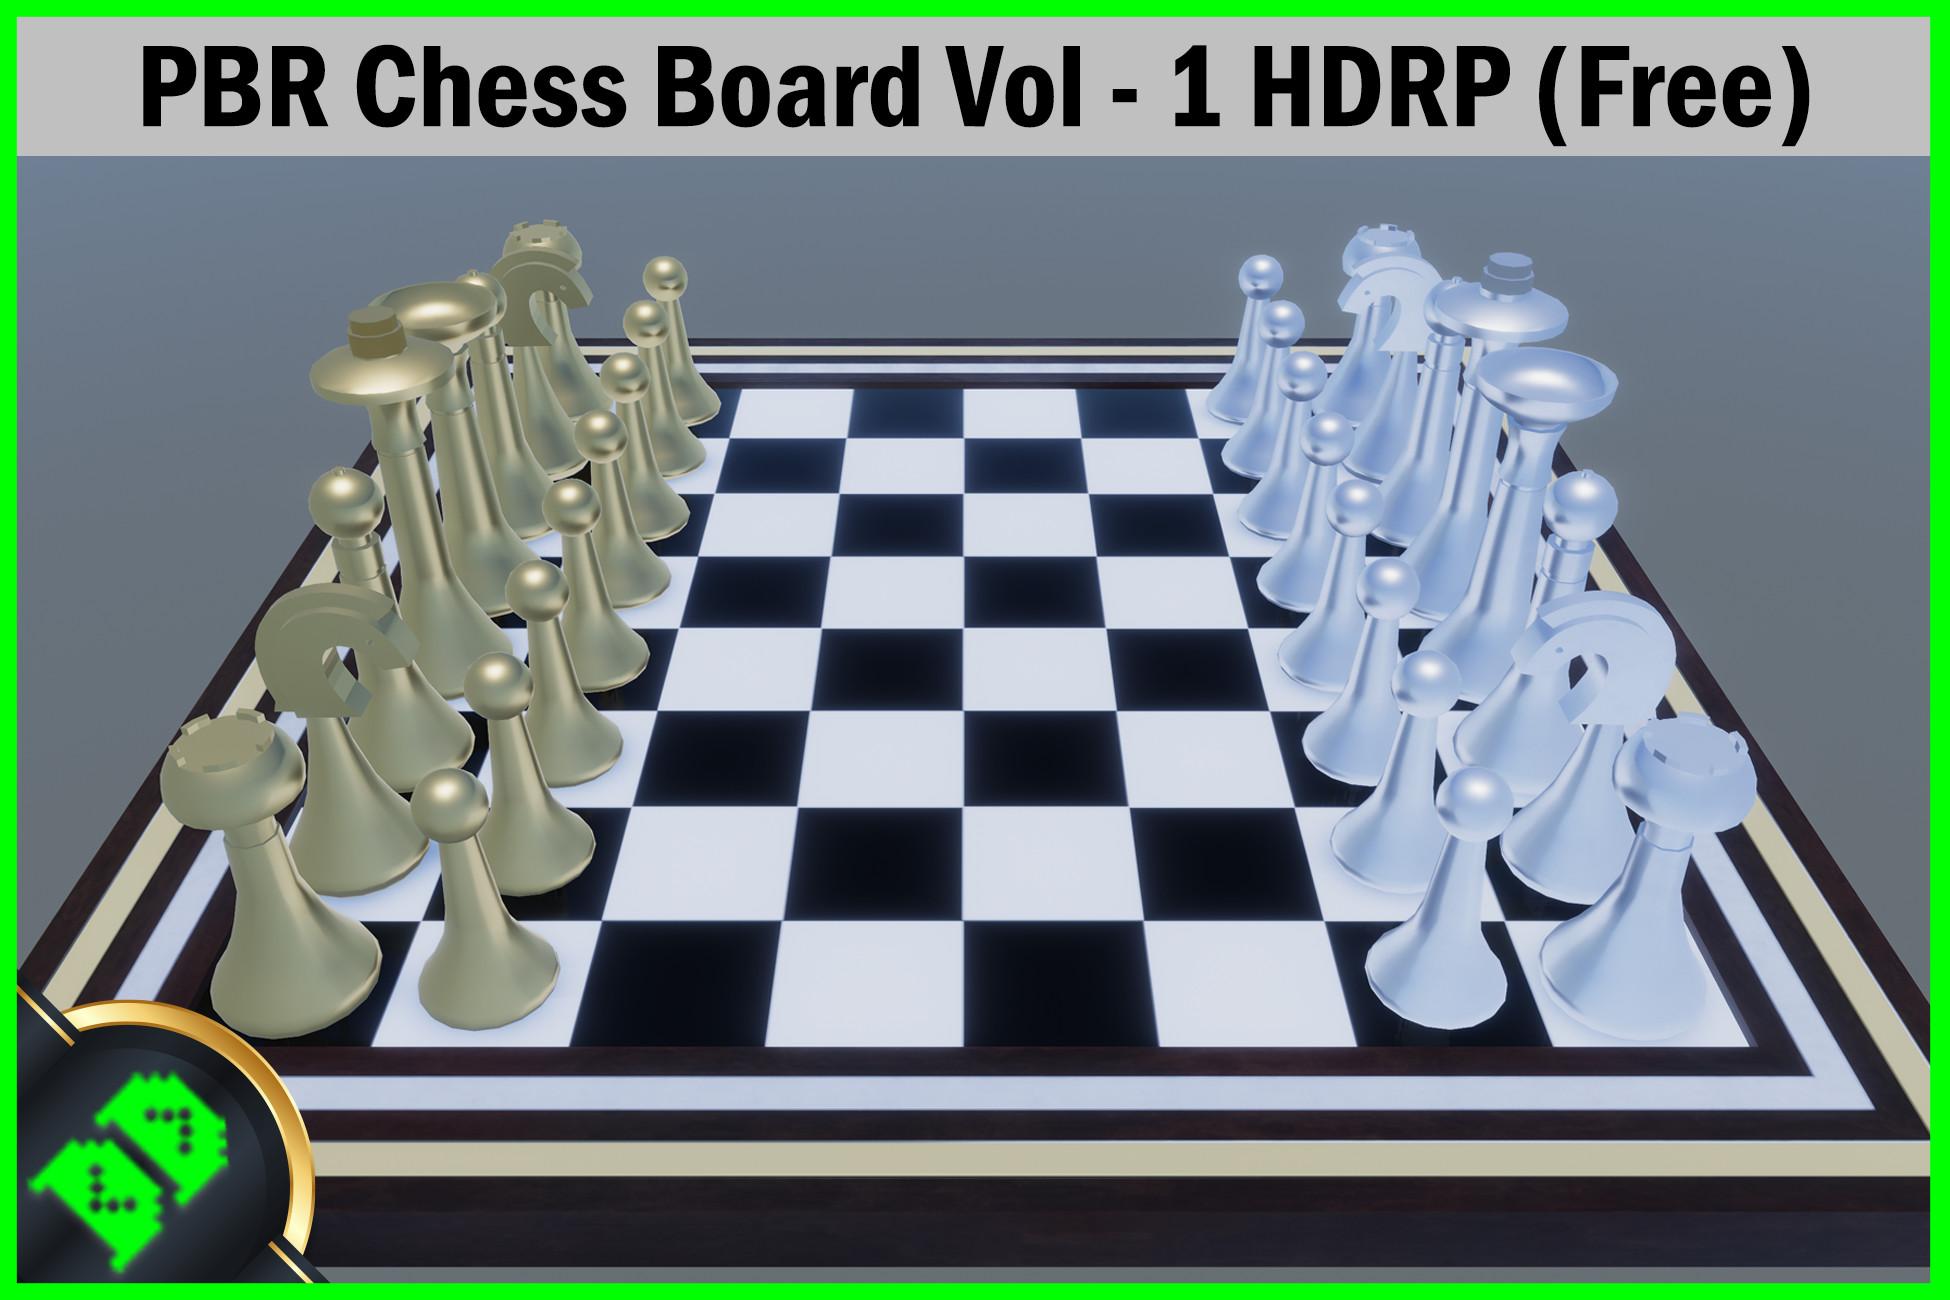 PBR Chess Board Vol - 1 HDRP